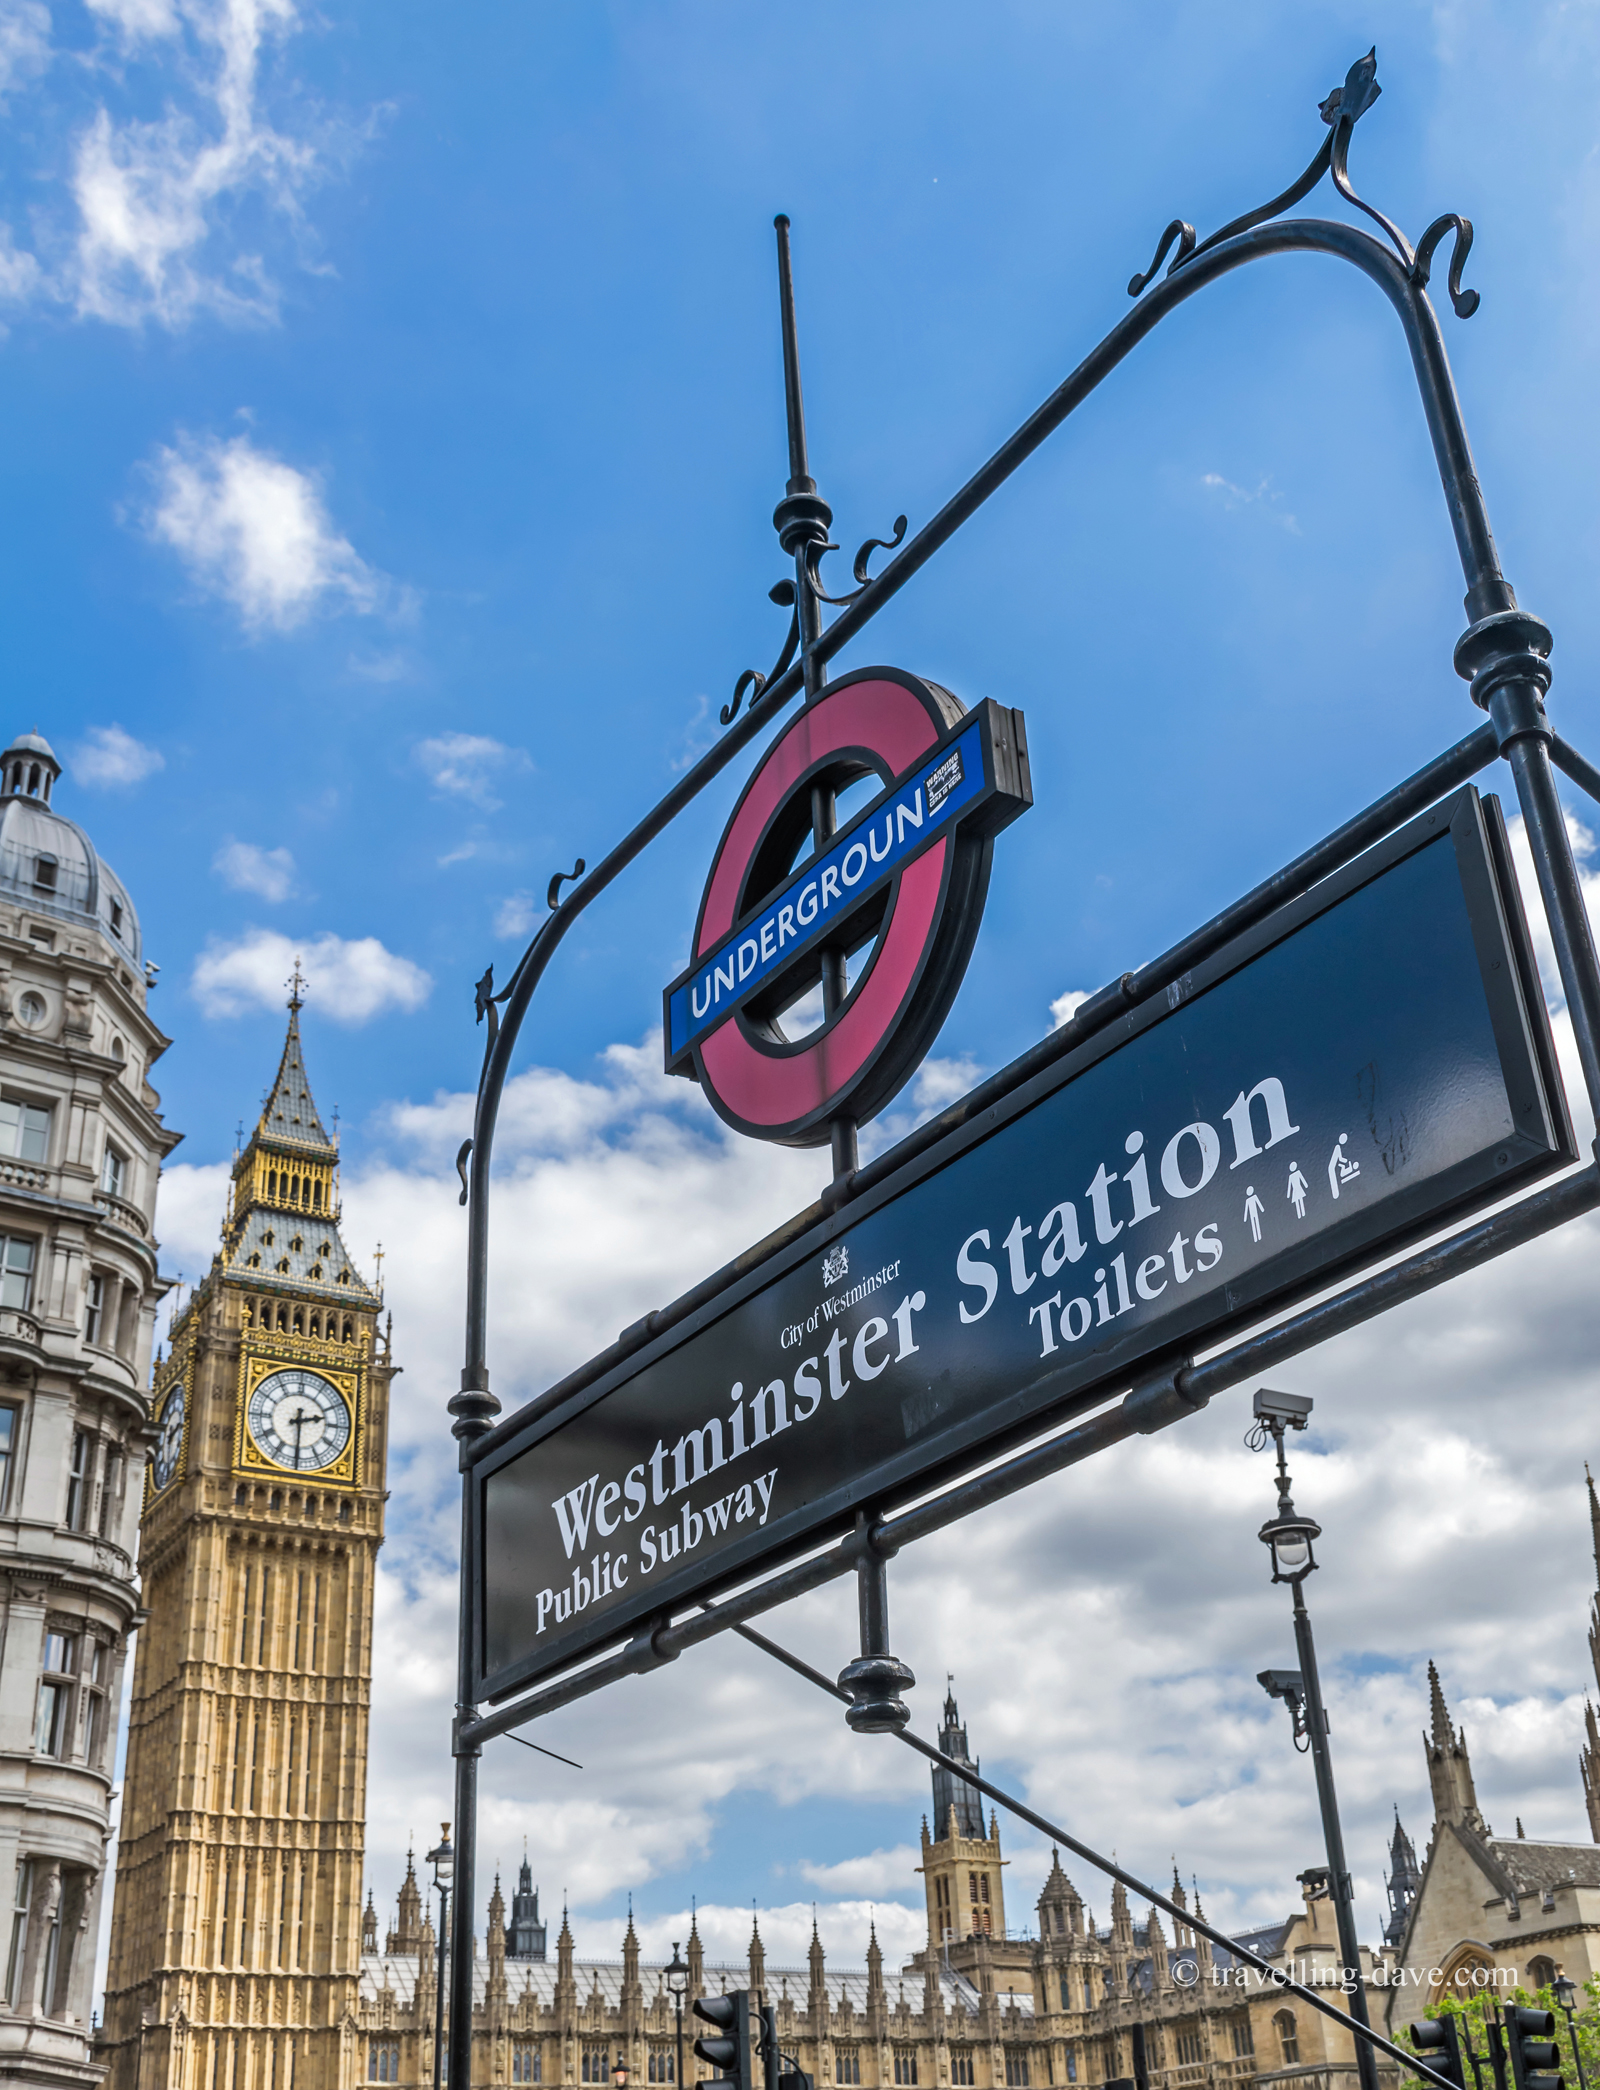 Westminster Underground Station sign